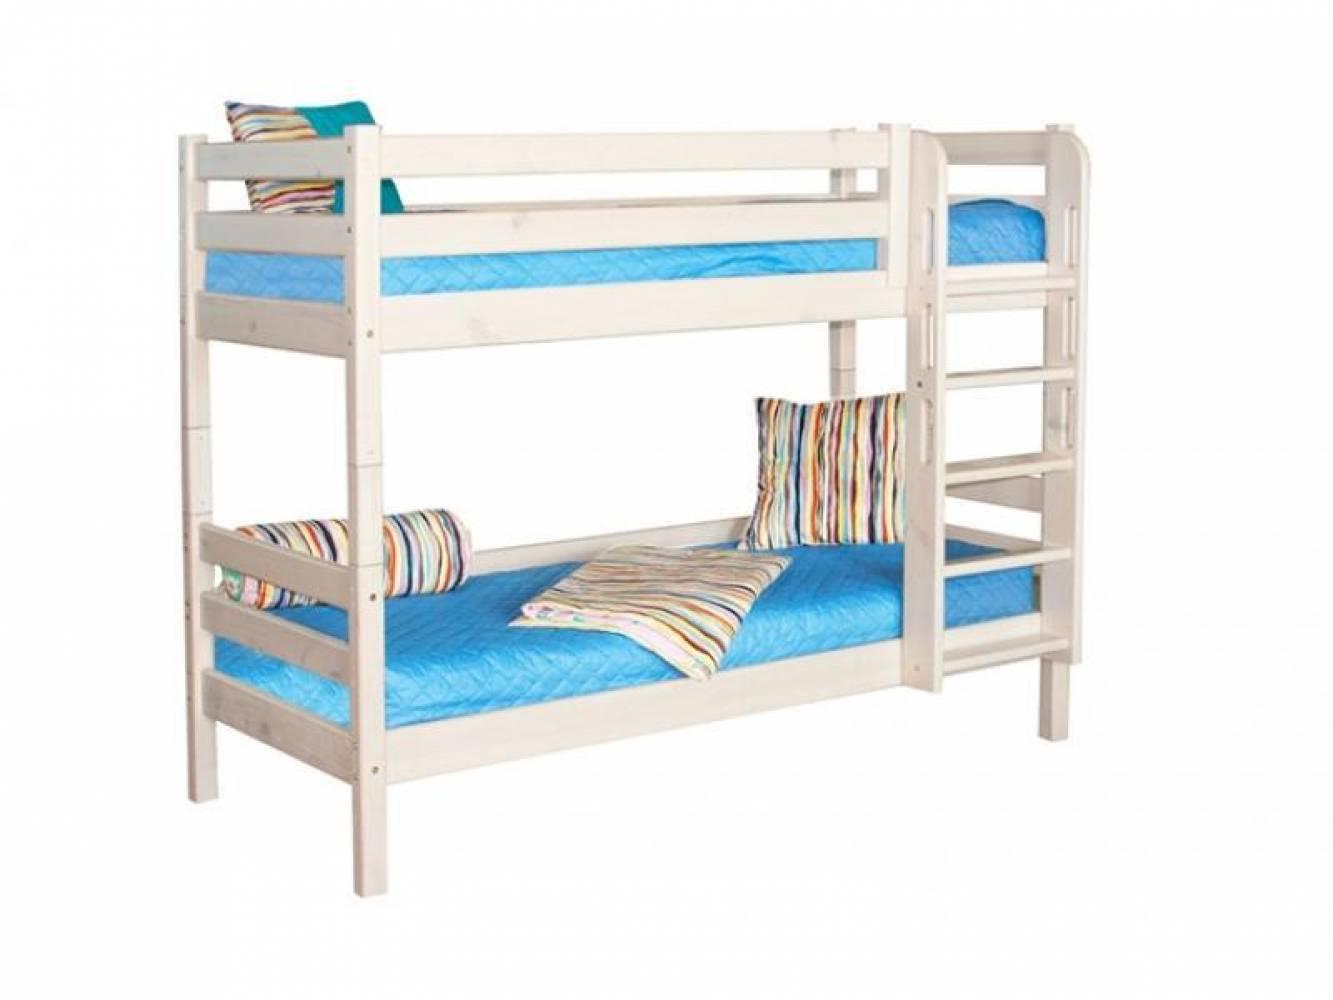 Двухъярусная кровать СОНЯ 9 с прям лест Мебельград